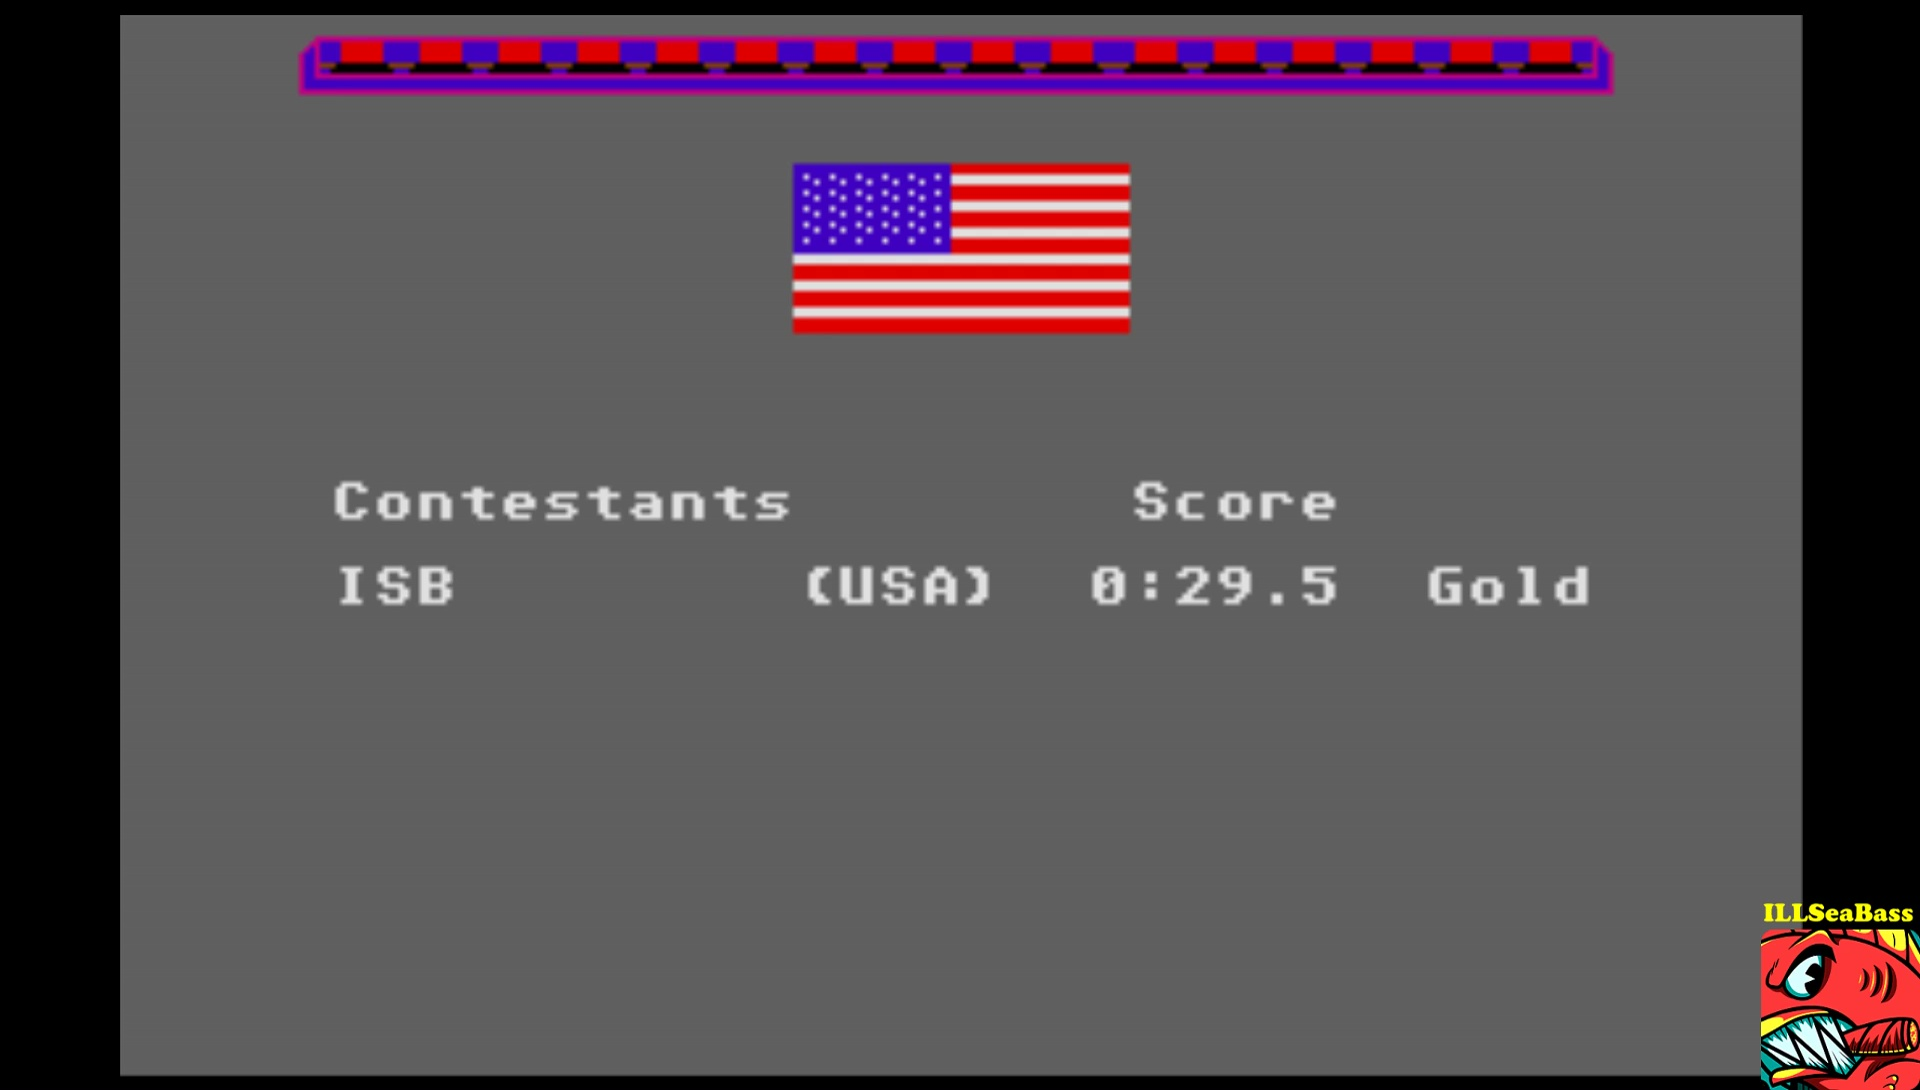 ILLSeaBass: Winter Games: Speed Skating (Atari ST Emulated) 0:00:29.5 points on 2017-03-04 20:46:42